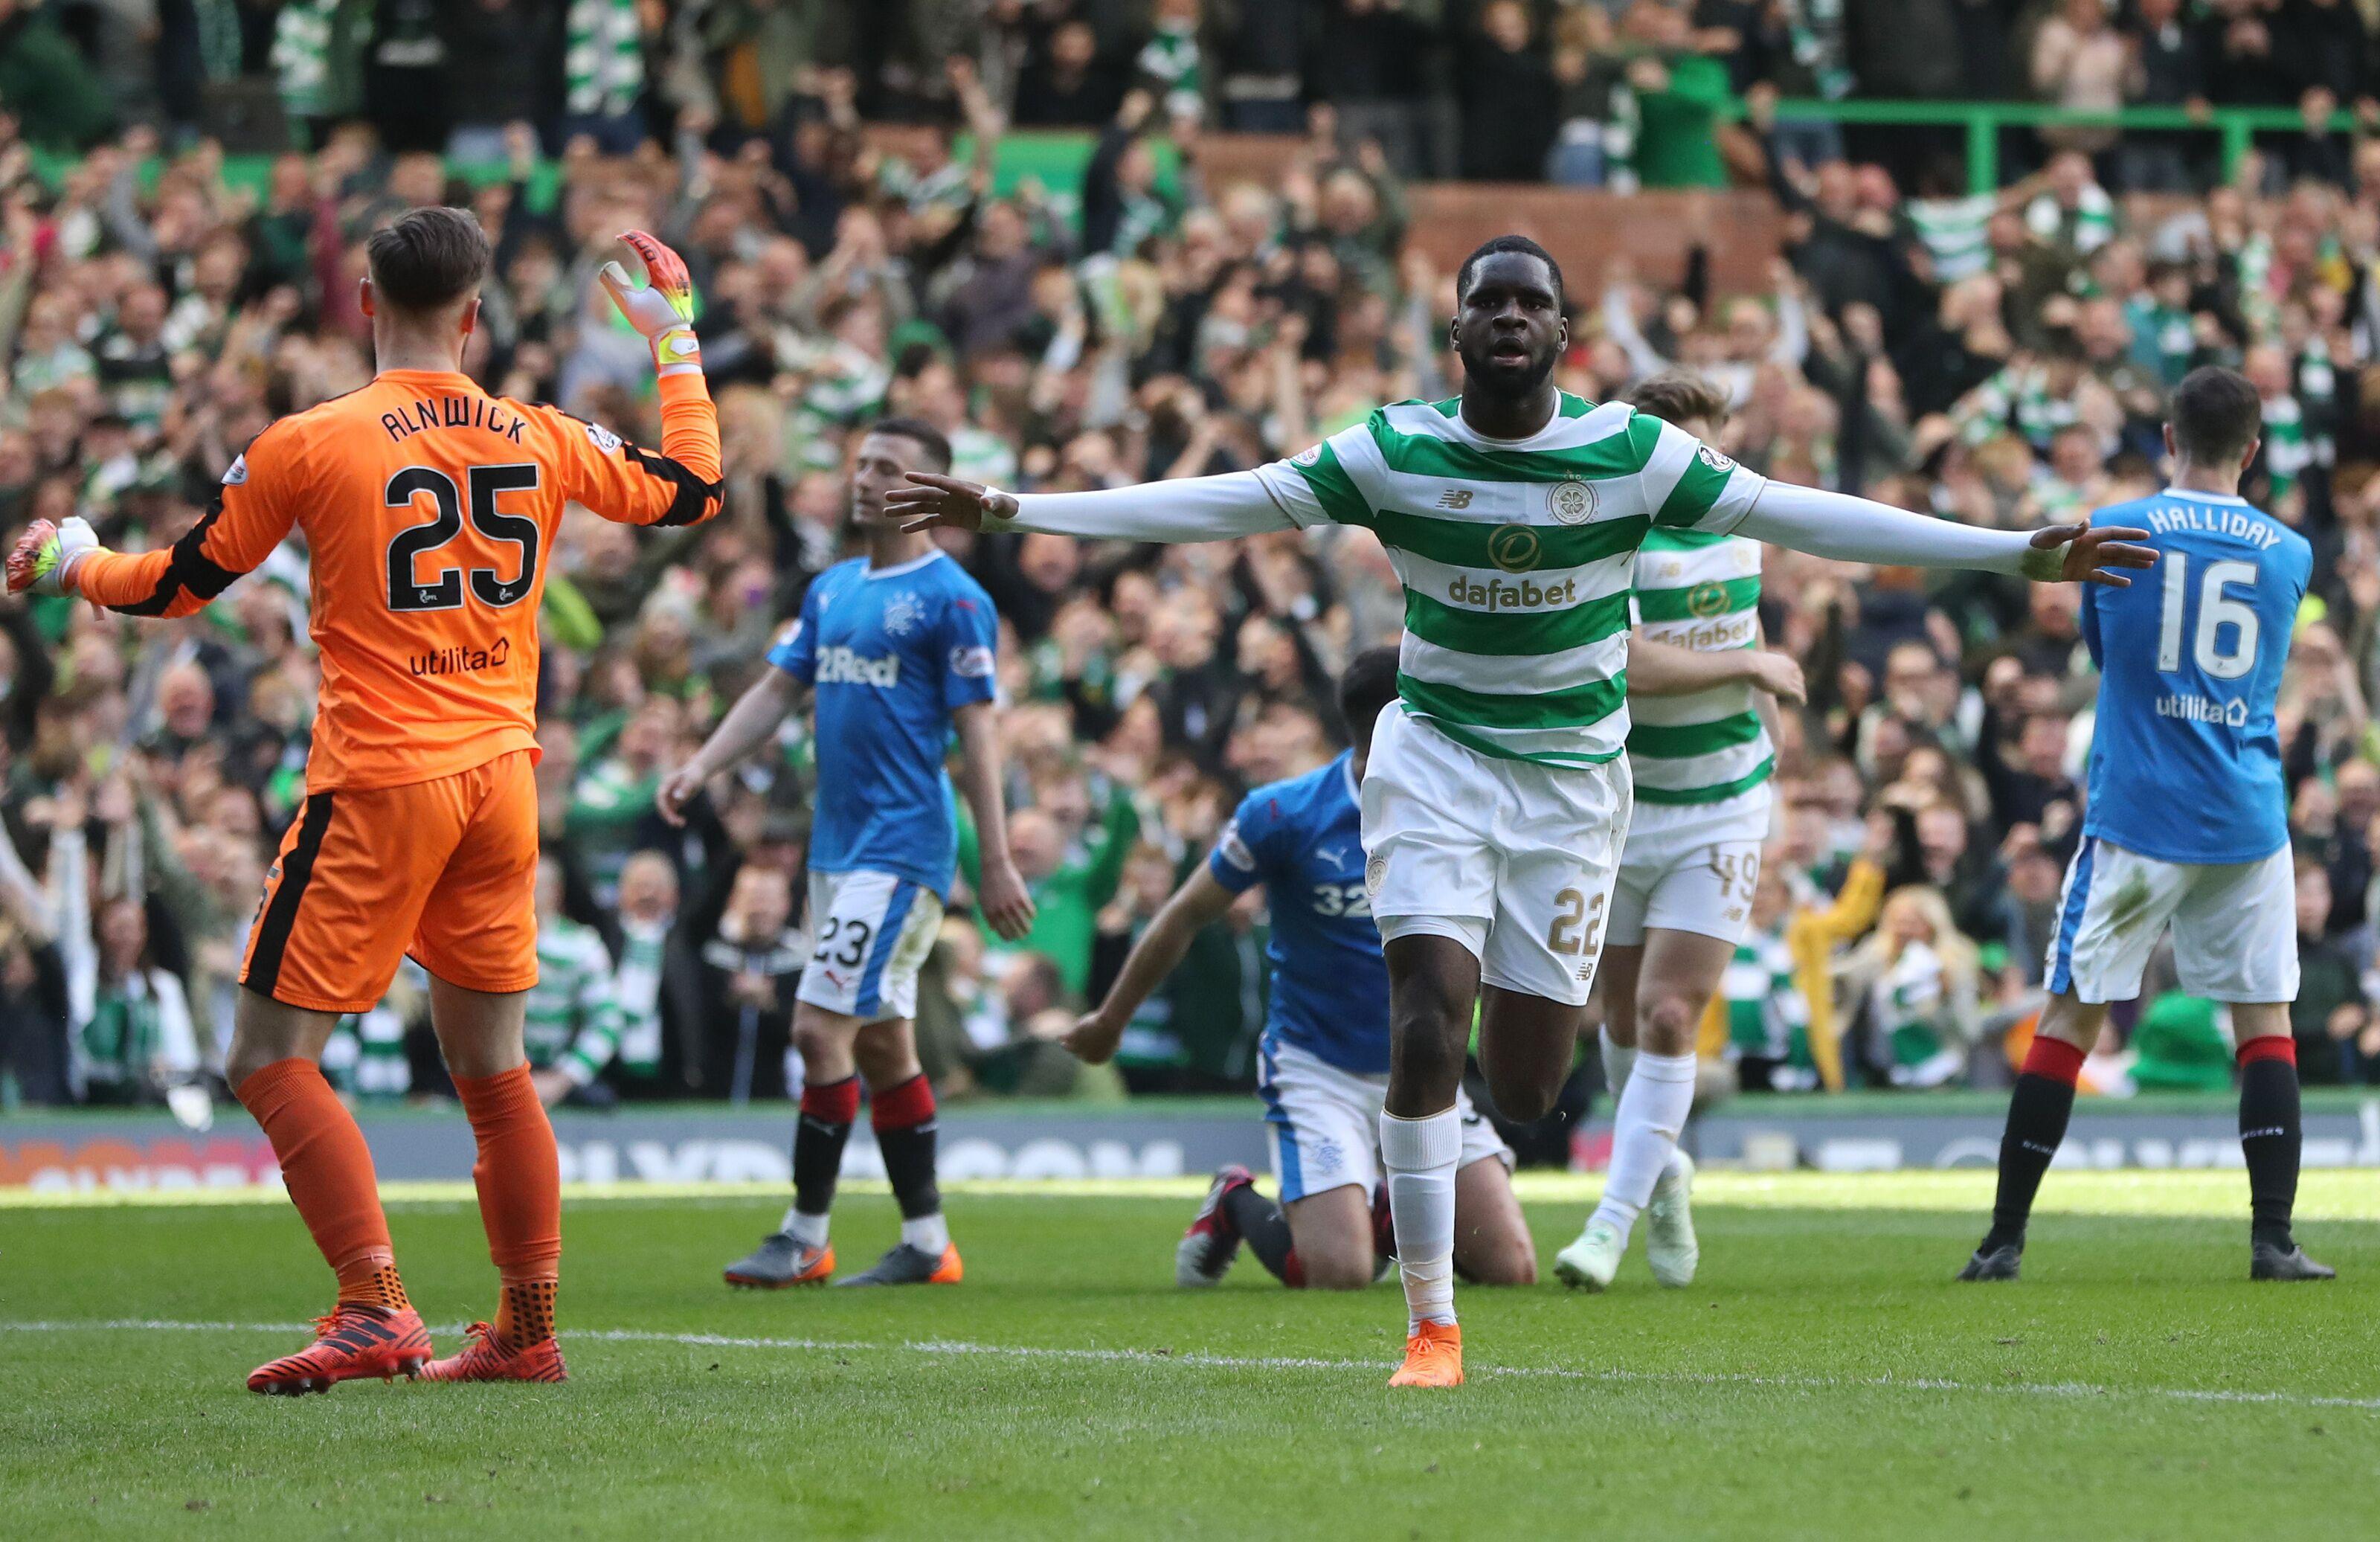 Celtic's Edouard Responds to Transfer Rumours